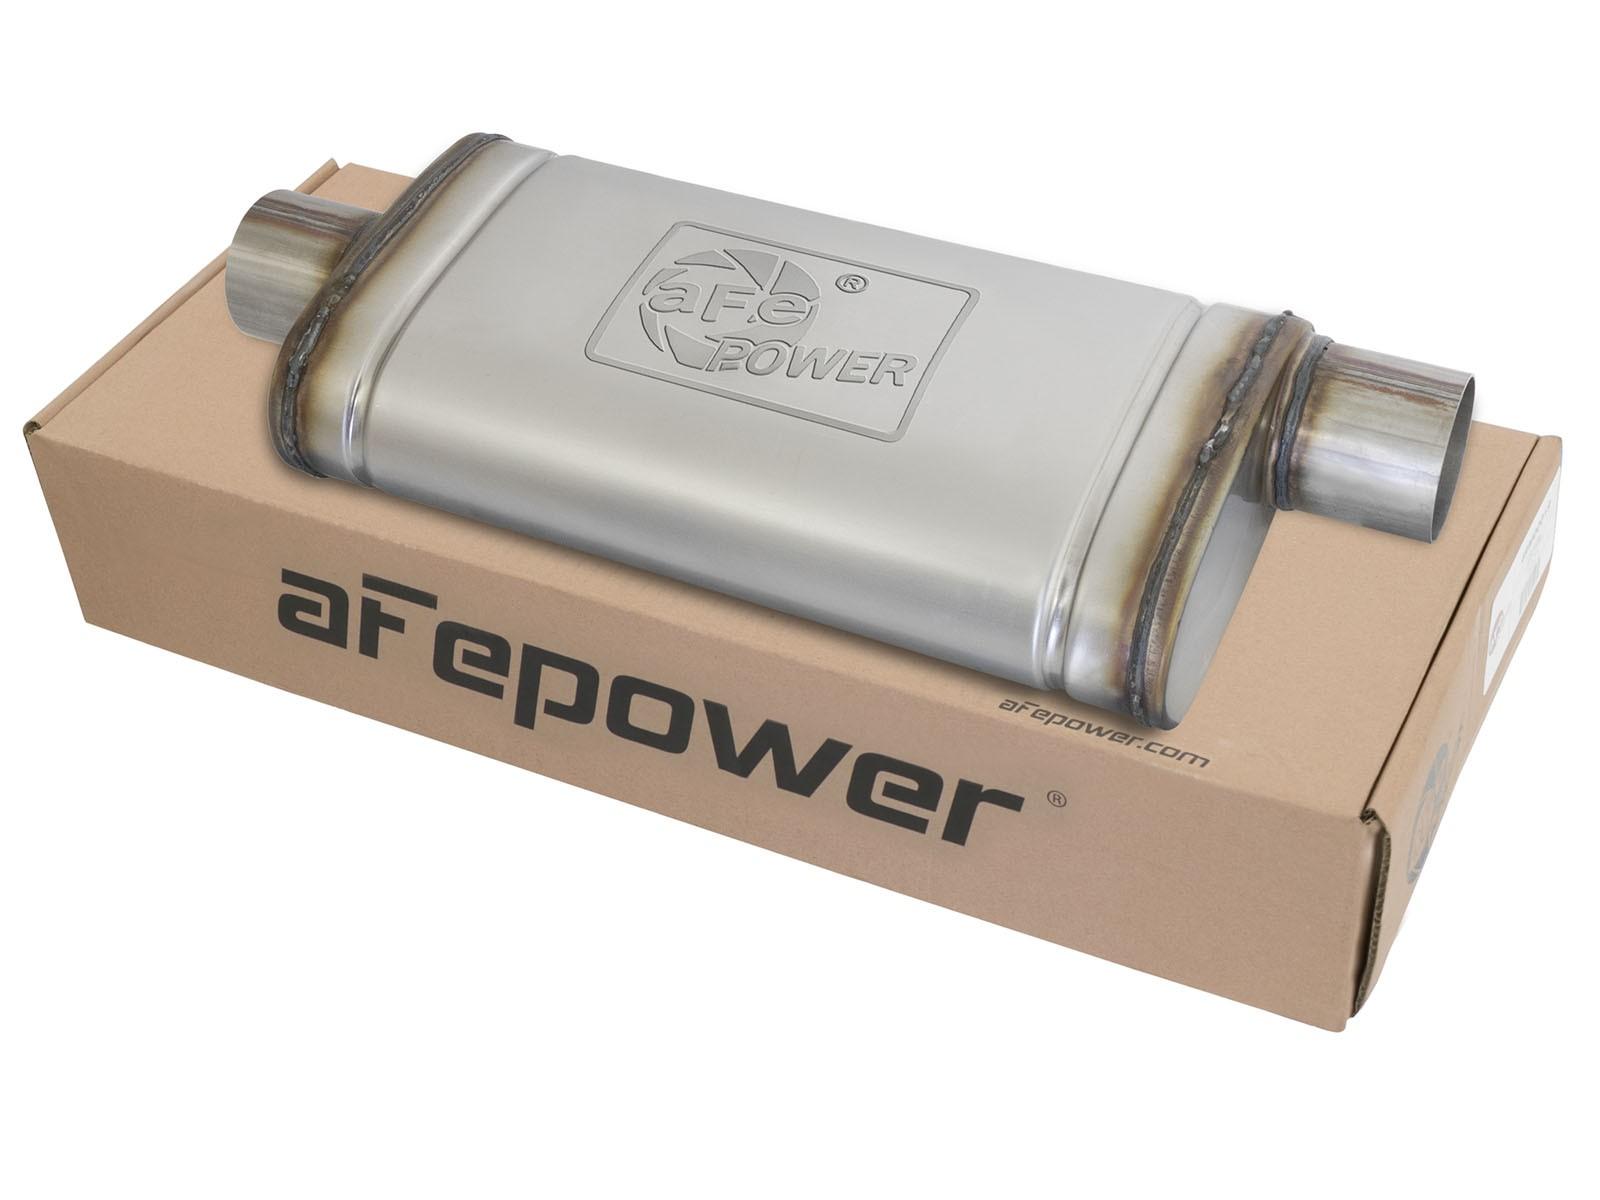 "aFe POWER 49M00020 MACH Force-Xp 3"" 409 Stainless Steel Muffler"